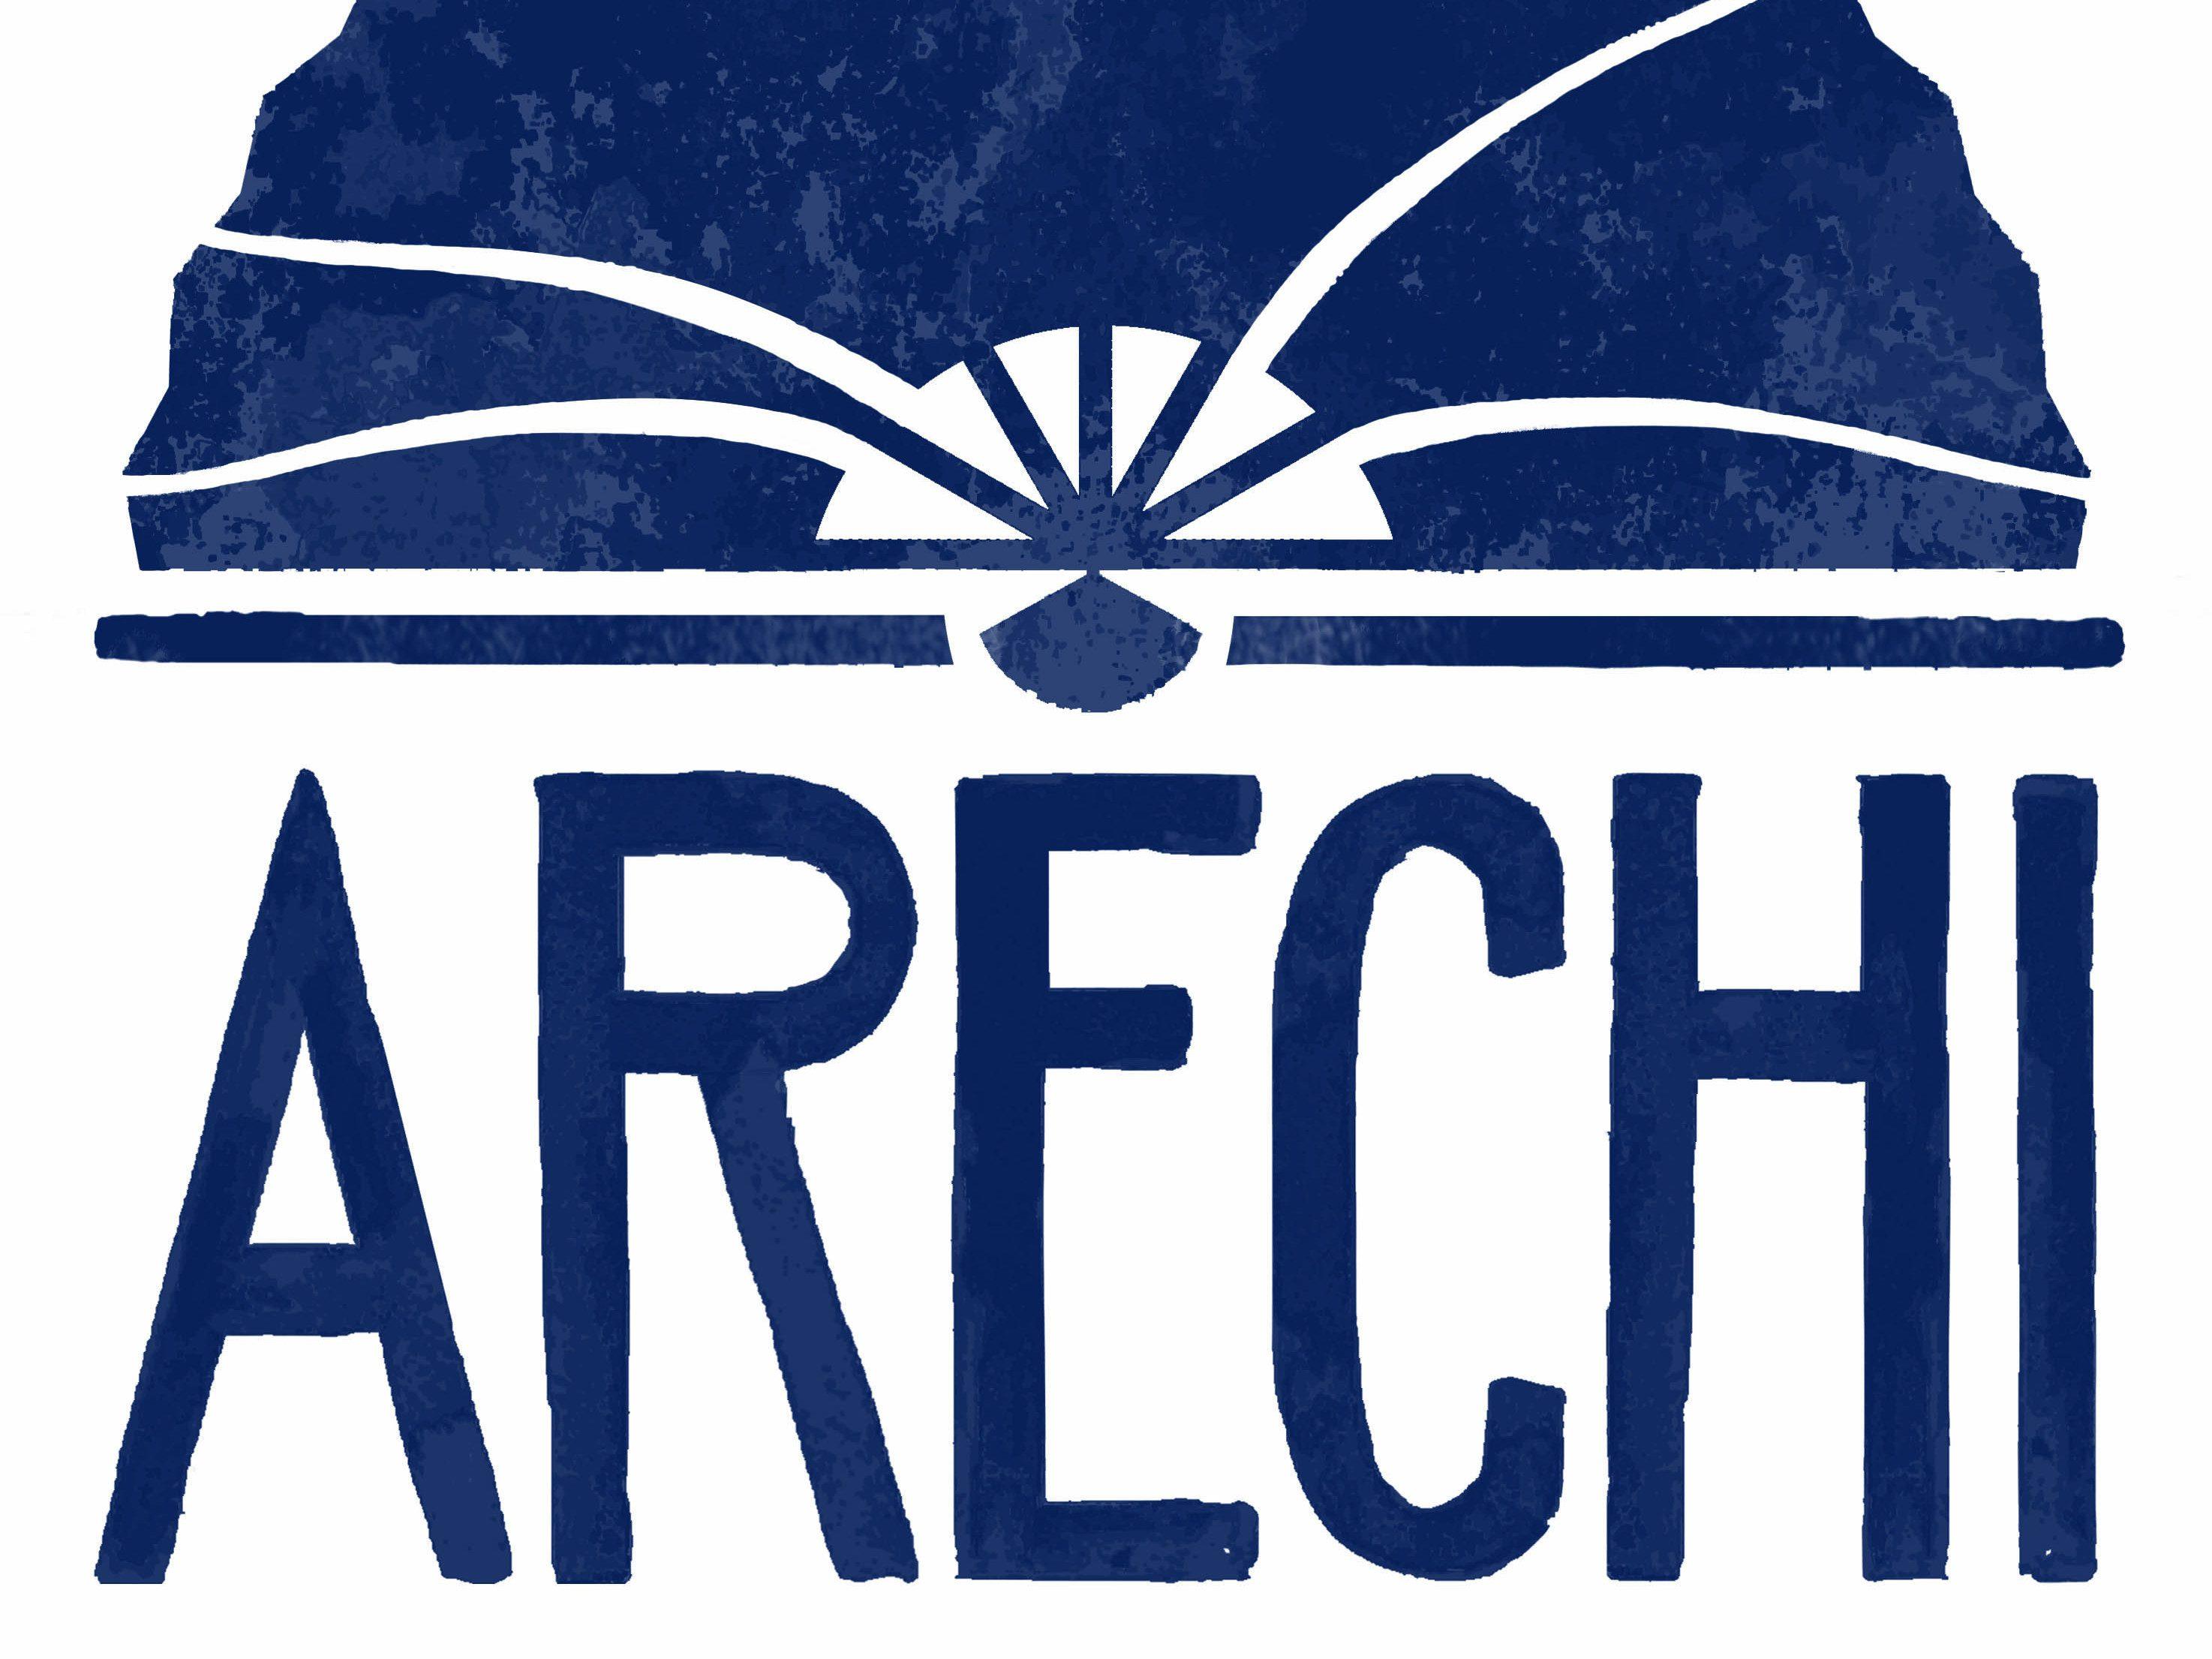 Novedades Arechi Manga Enero 2021